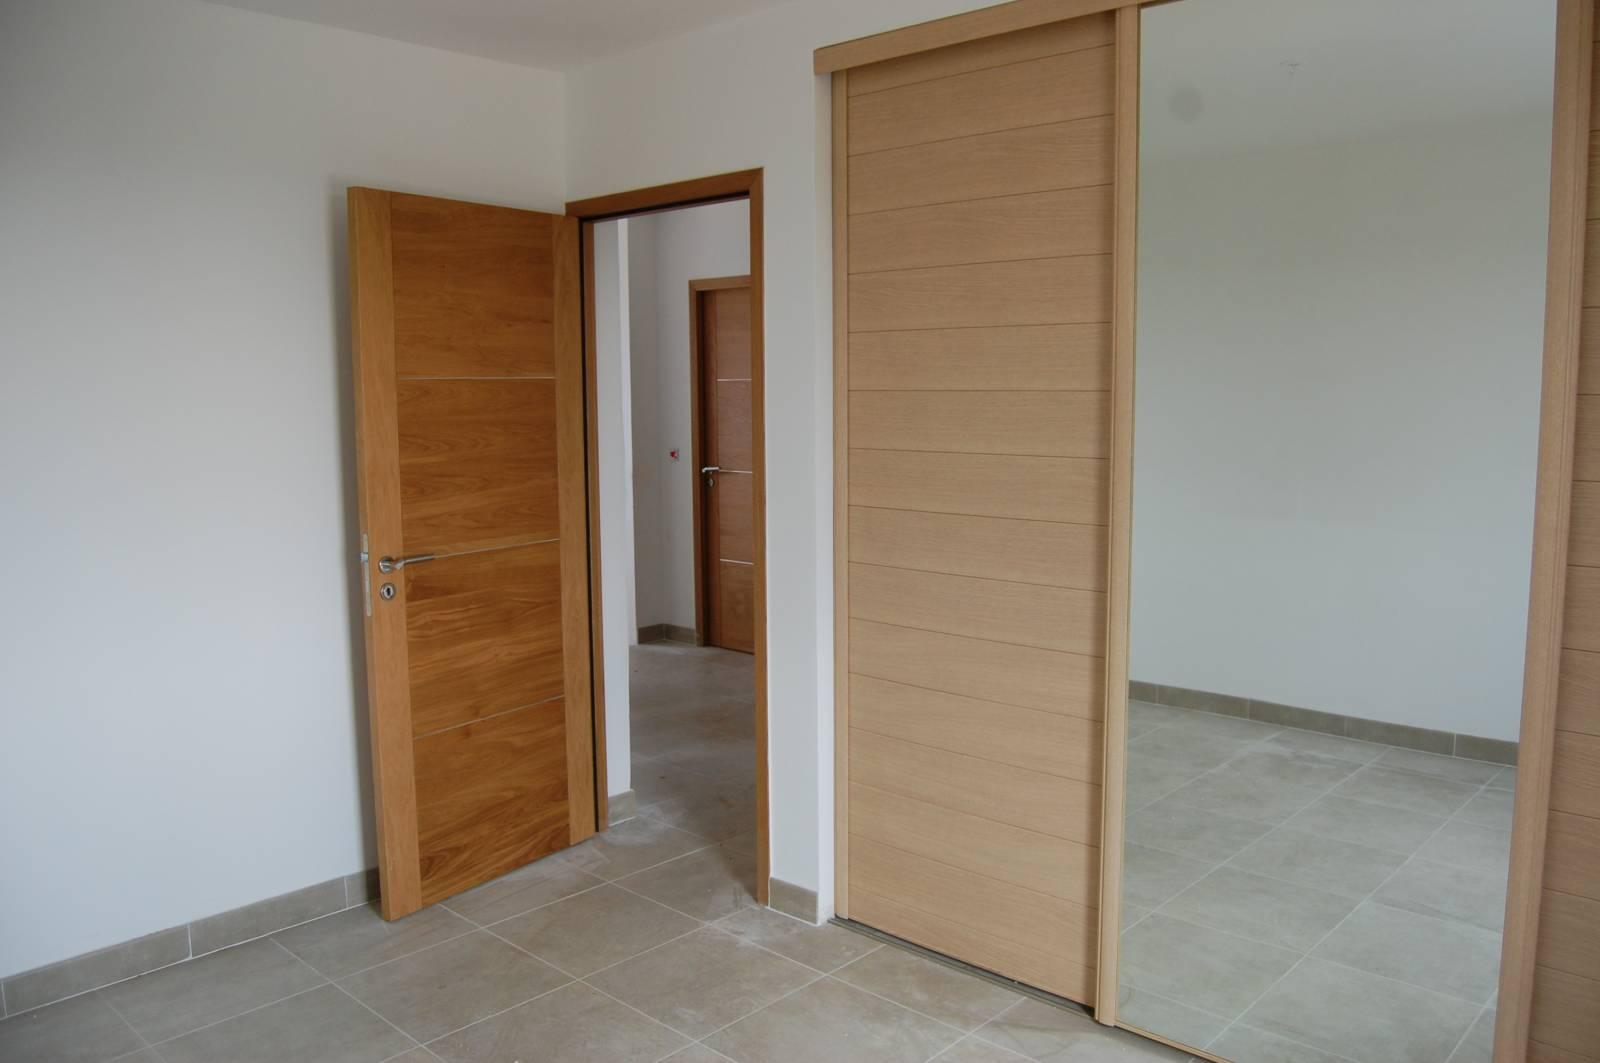 installation de portes int rieures ch ne massif et. Black Bedroom Furniture Sets. Home Design Ideas